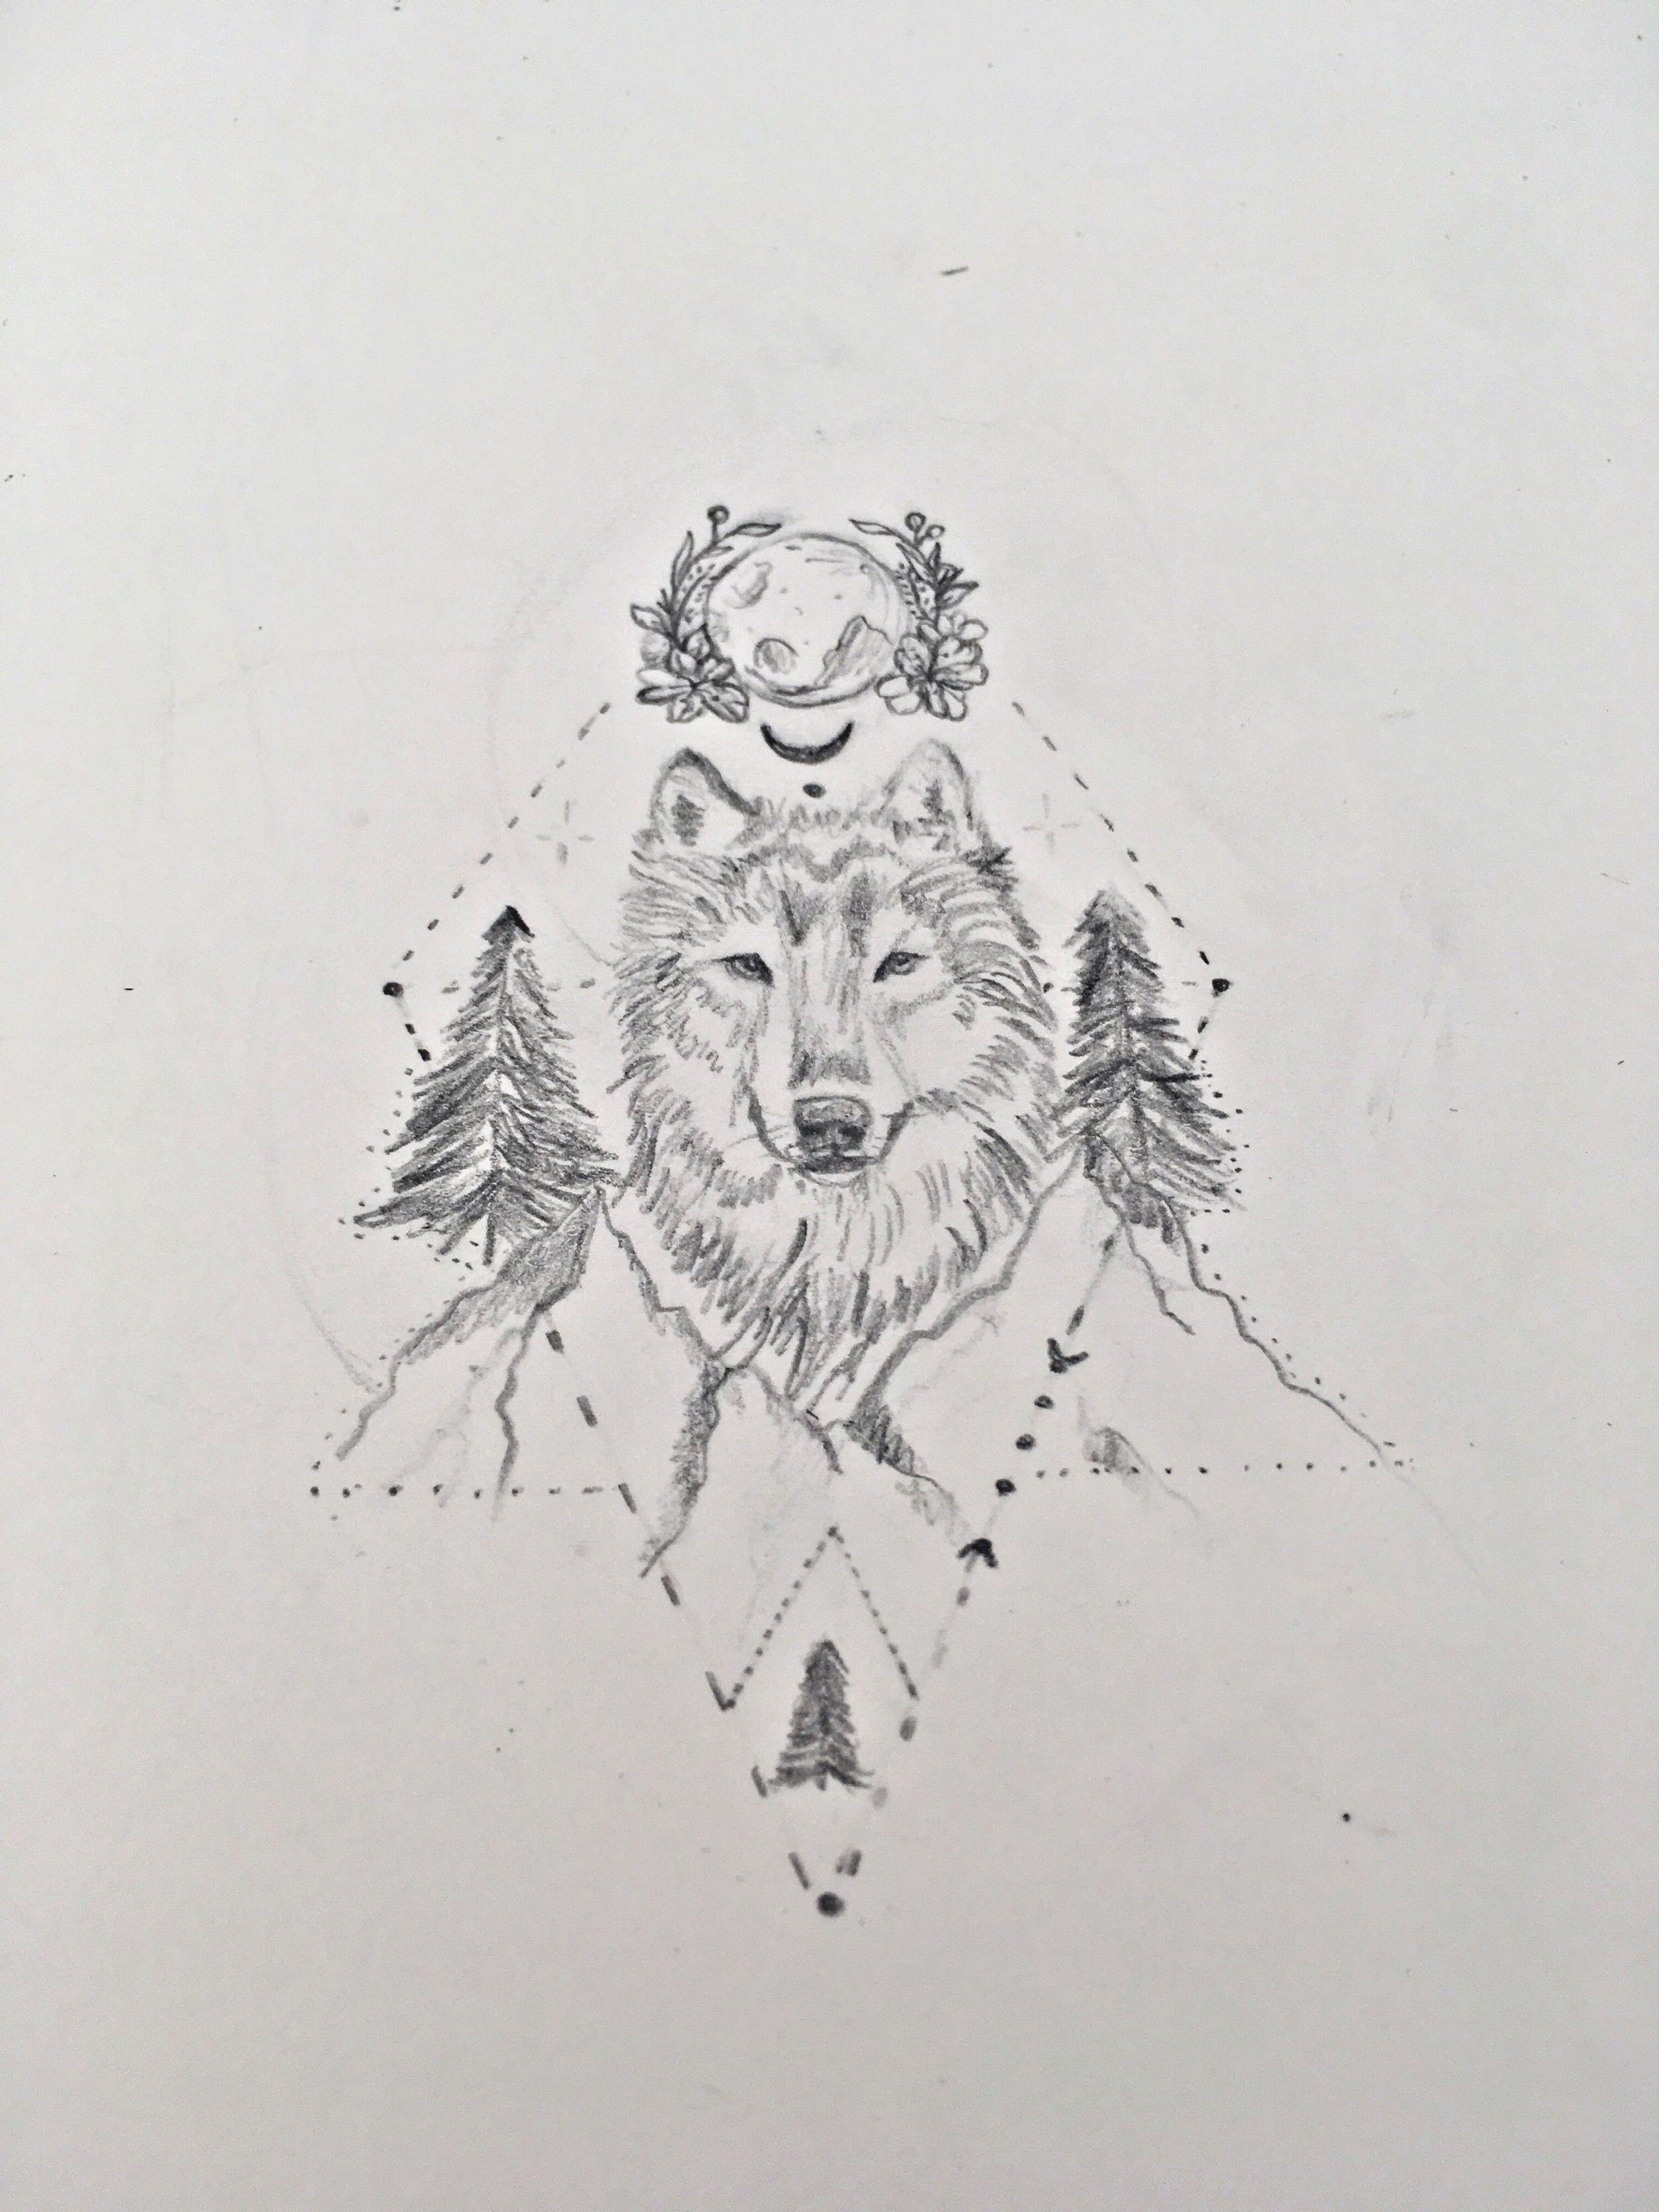 dessin tatouage loup tattoo wolf wolf designs de. Black Bedroom Furniture Sets. Home Design Ideas